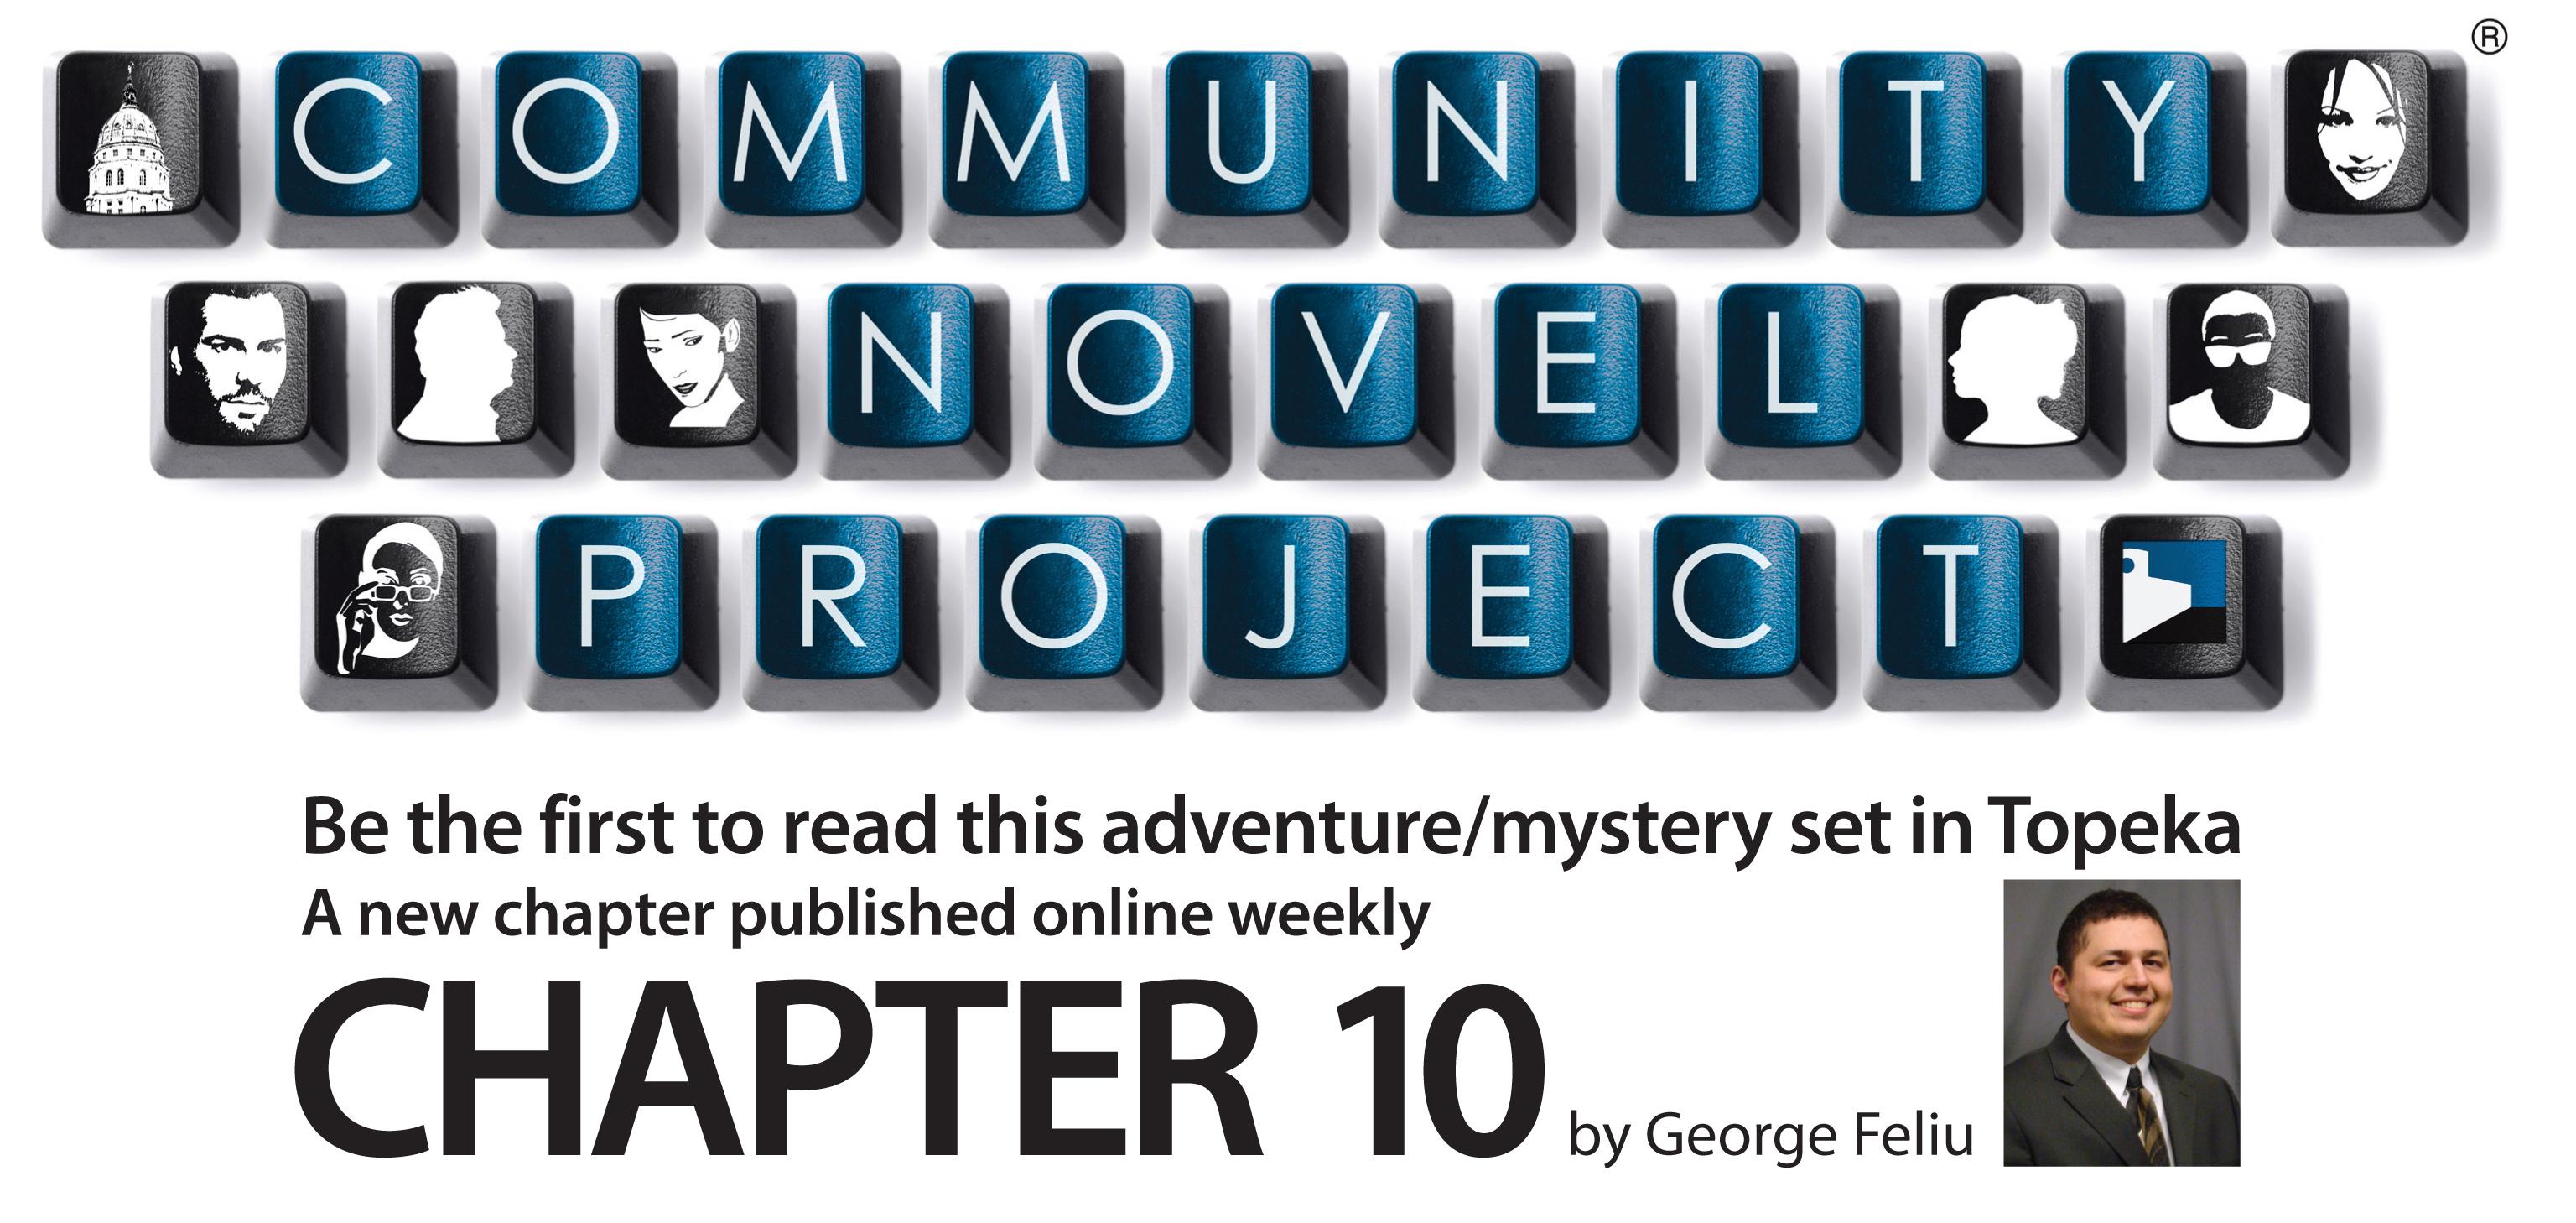 community novel chapter 10